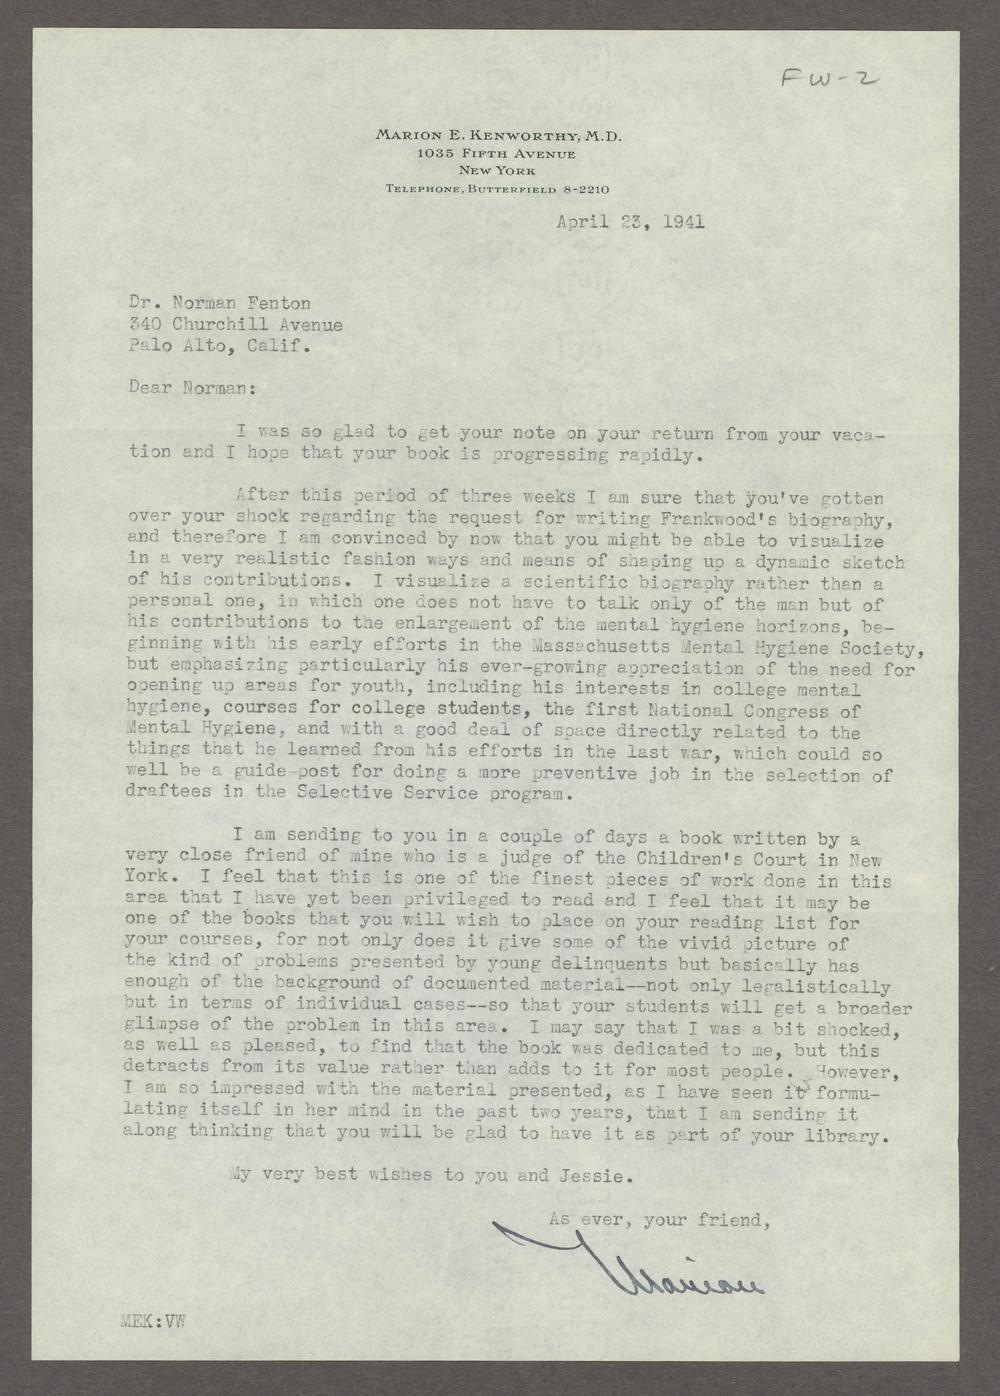 Frankwood E. Williams Papers - 6